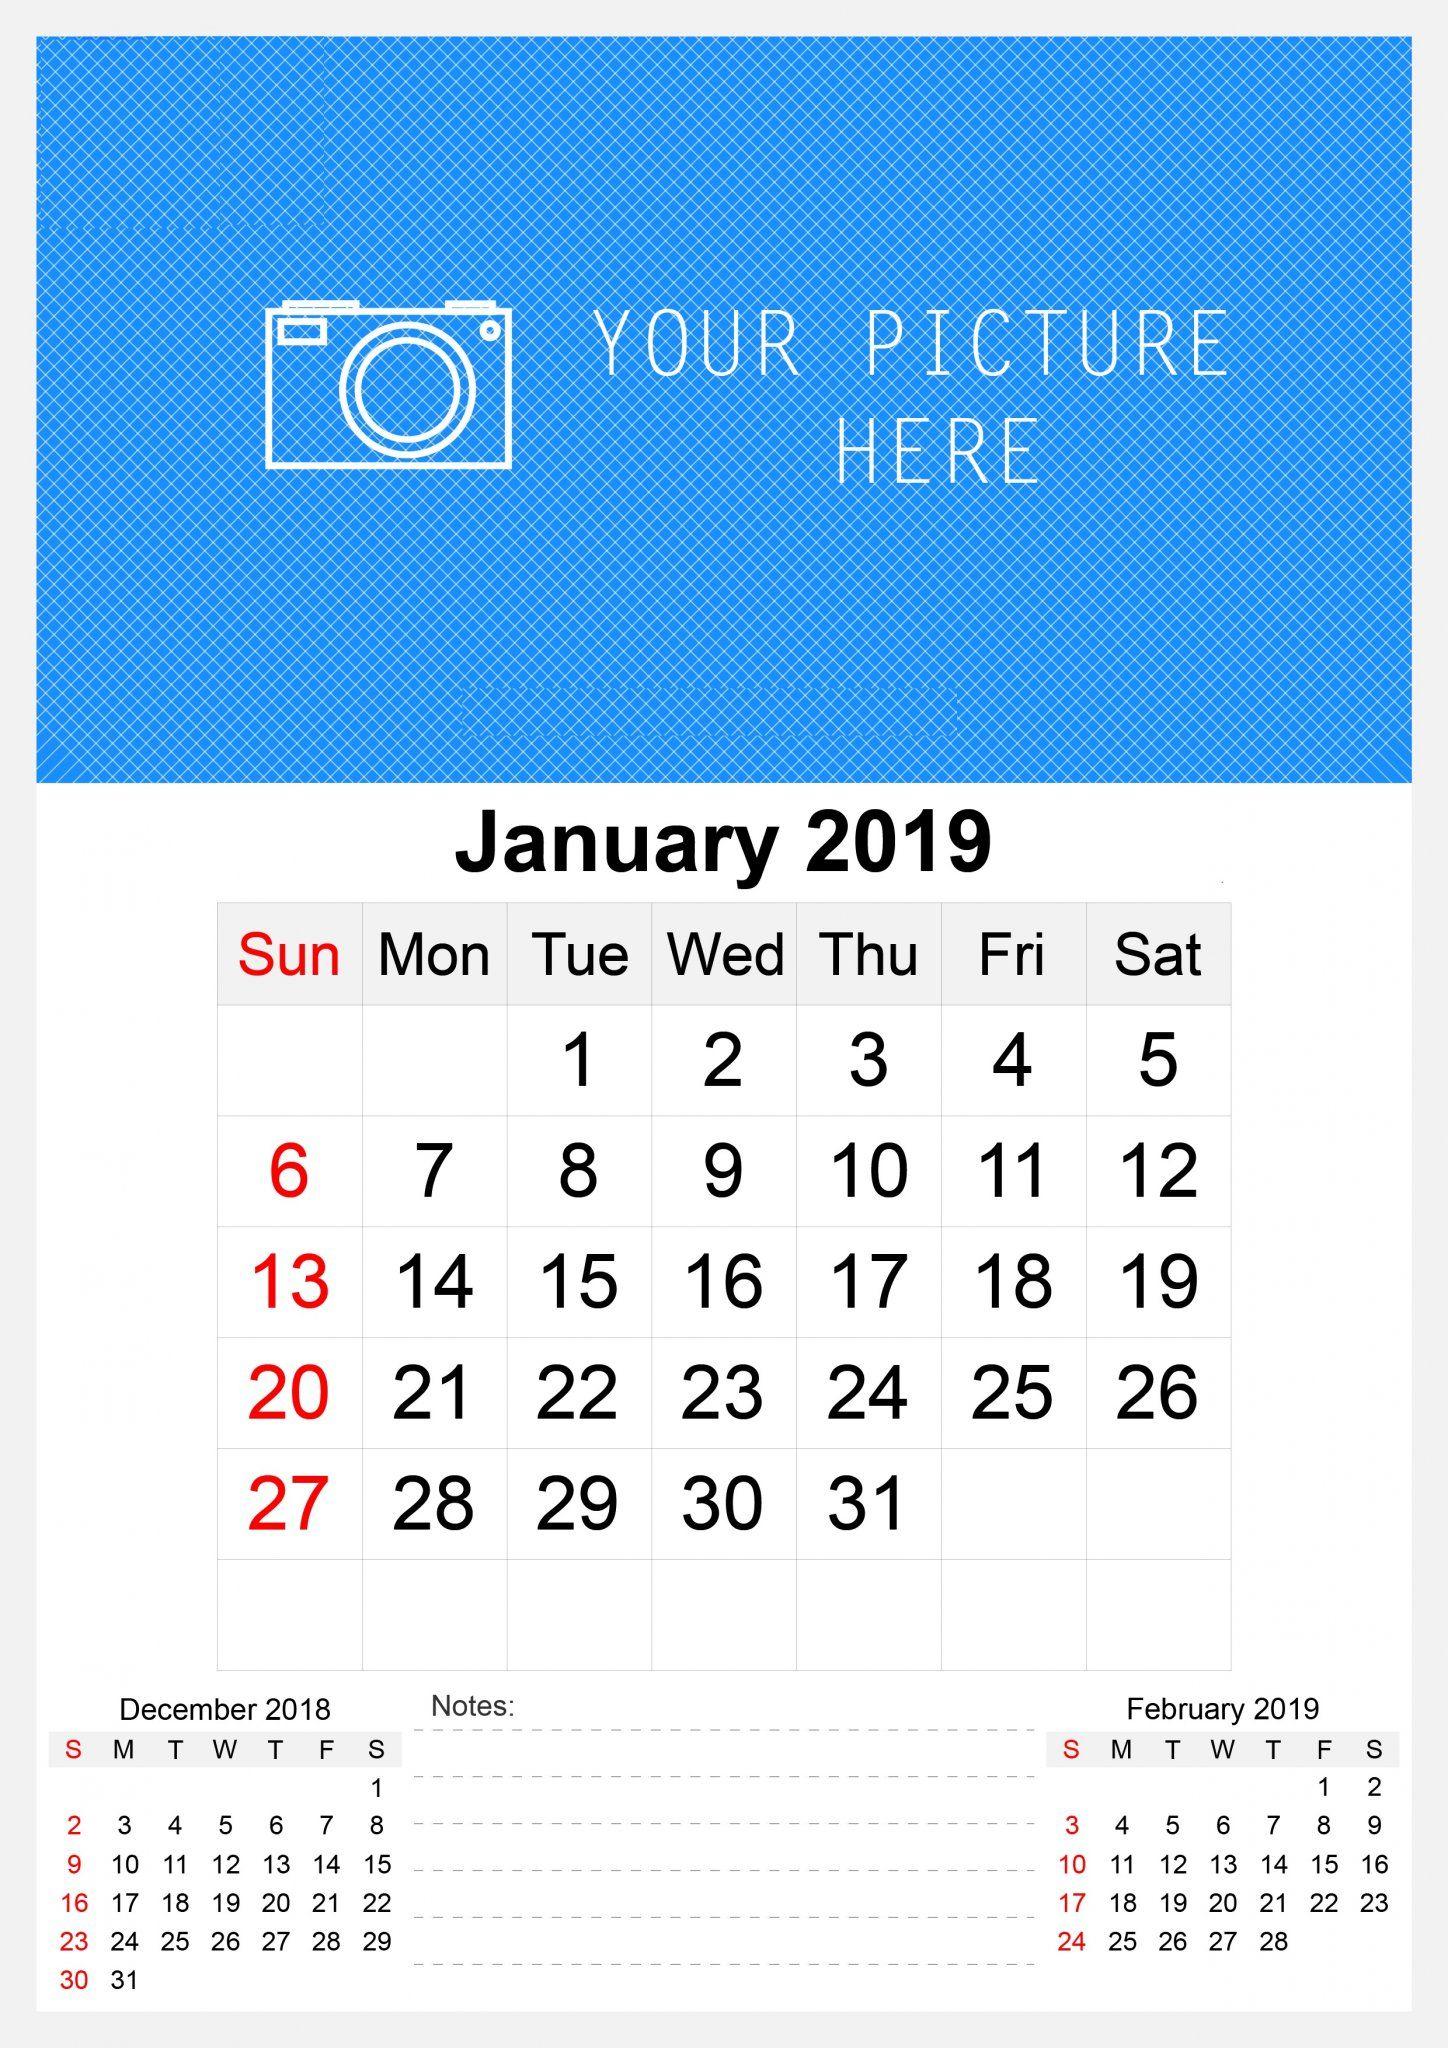 January 2019 Printable Calendardaily Quotes January 2019 Wall Calendar #January #January2019